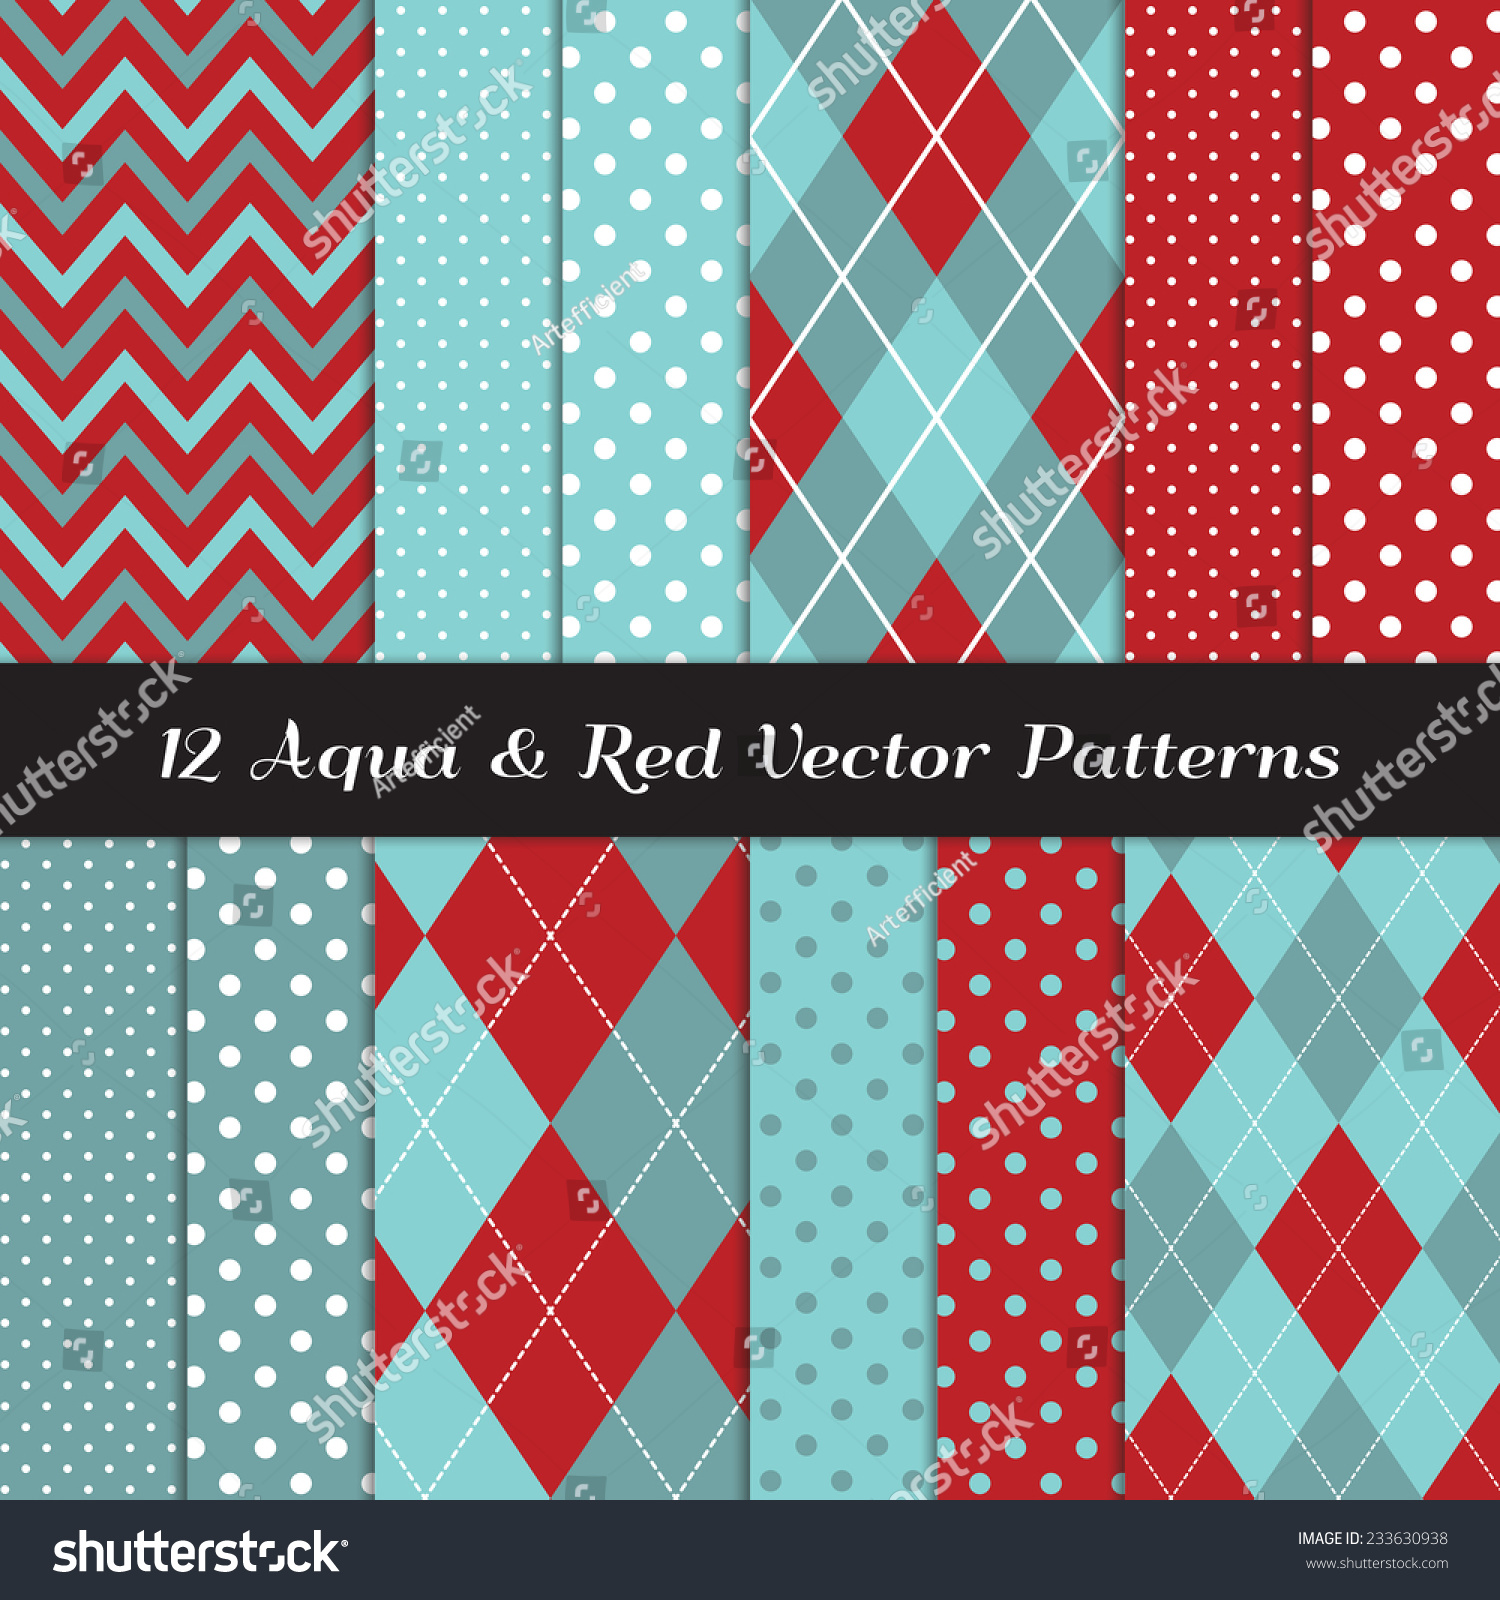 Pics photos merry christmas argyle twitter backgrounds - Two Tone Aqua Blue And Red Chevron Argyle And Polka Dot Patterns Soft Aqua